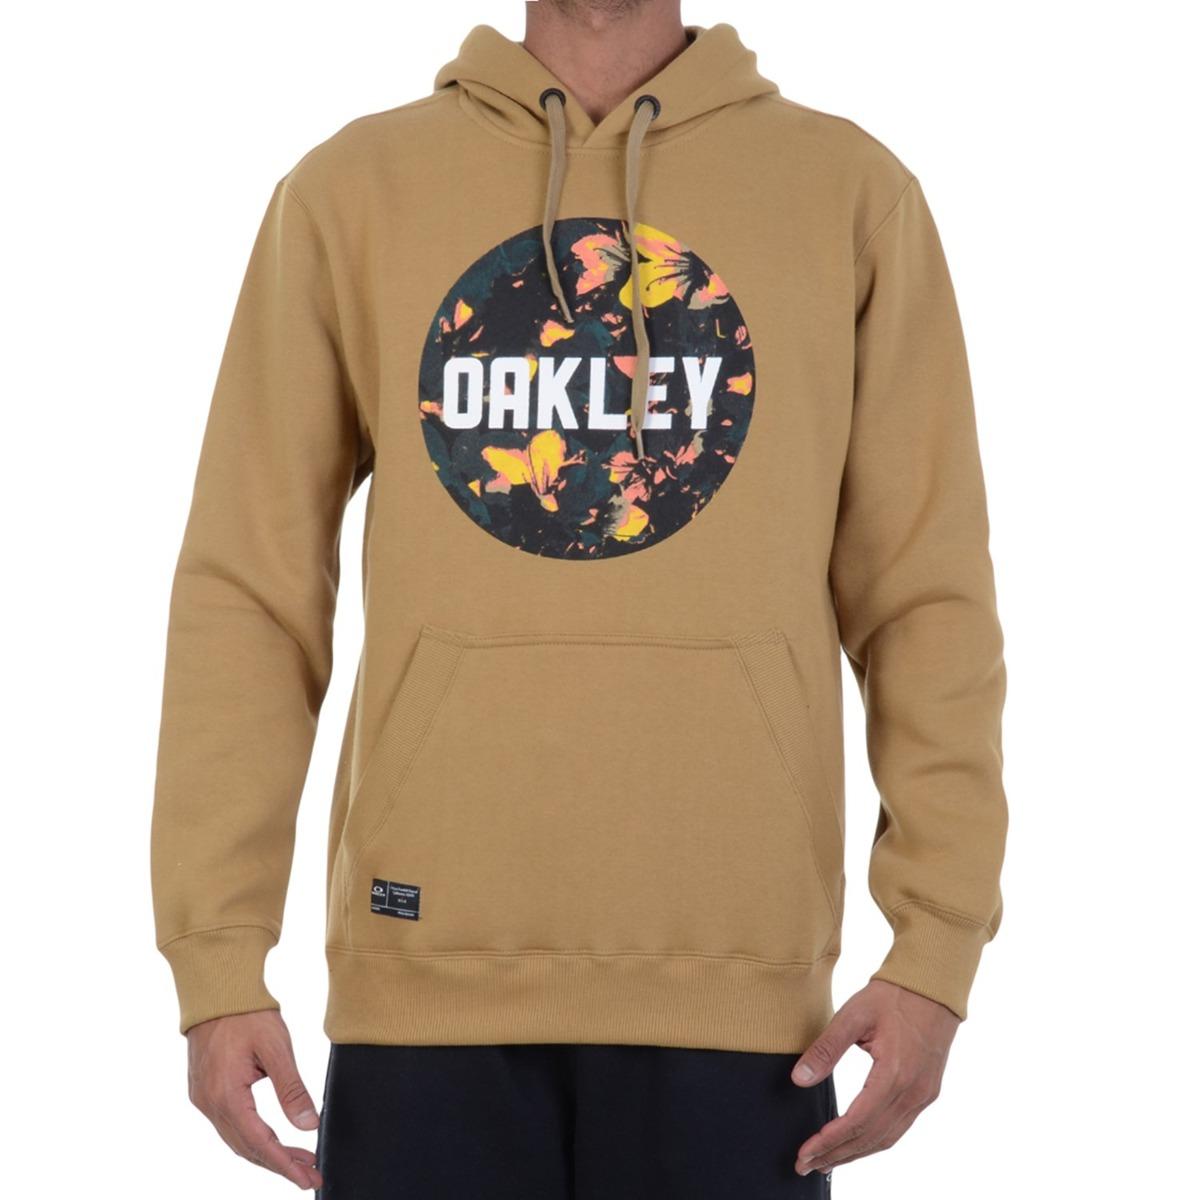 moletom oakley surface graphic bege. Carregando zoom. 8809dc91b44d4